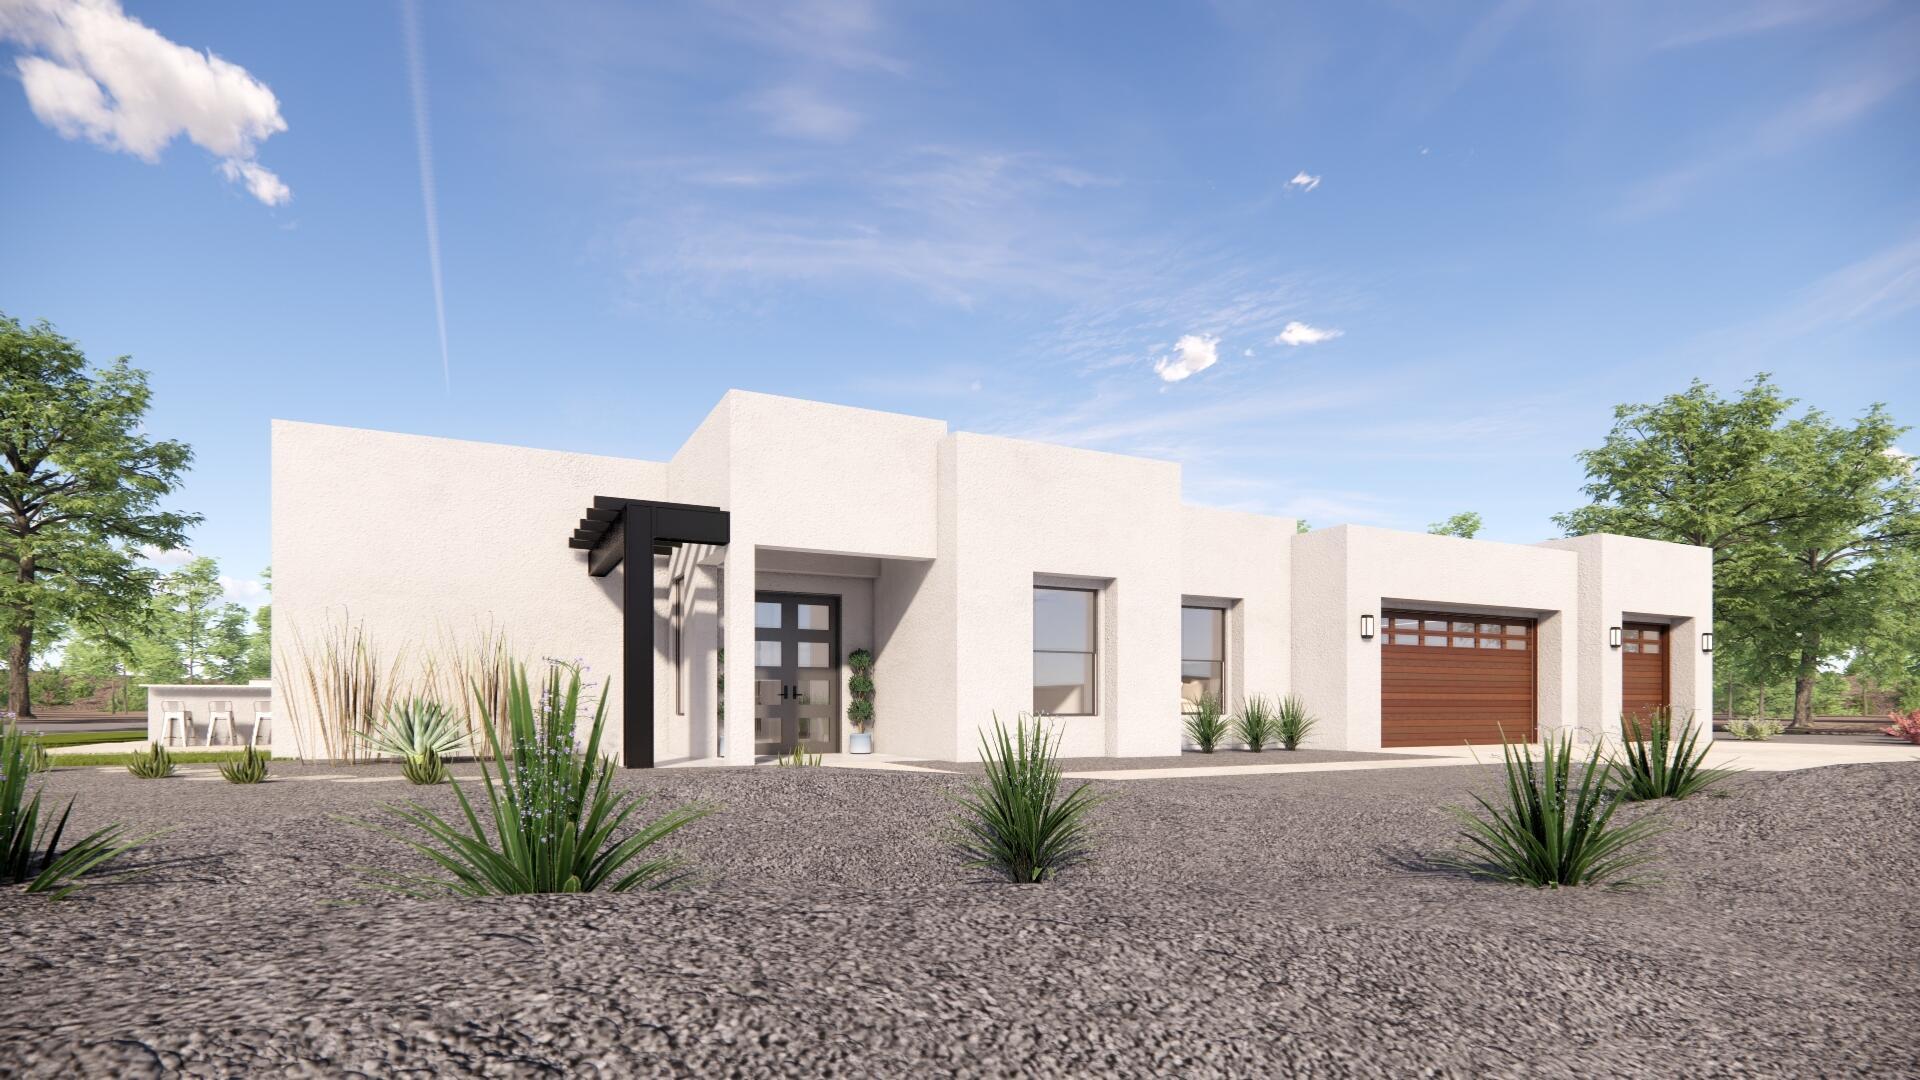 10 PASEO DEL LUZ DE NOCHES Property Photo - Corrales, NM real estate listing